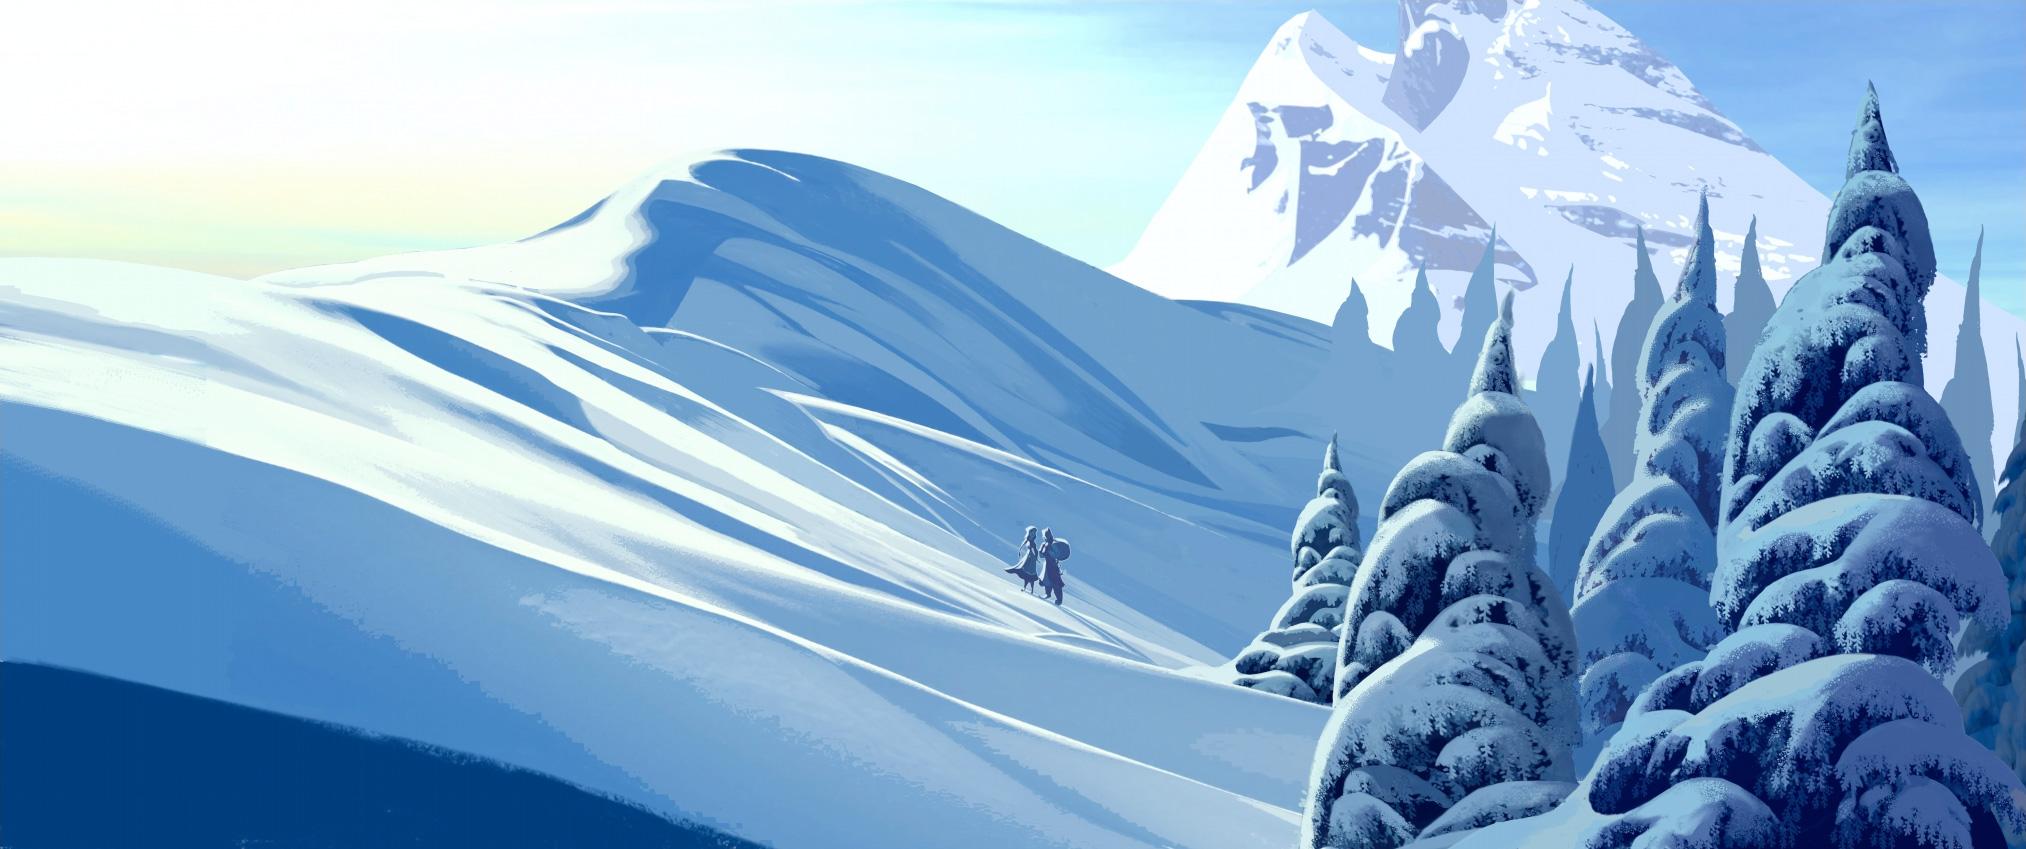 Disney_Frozen_Concept_Art El arte conceptual de Frozen